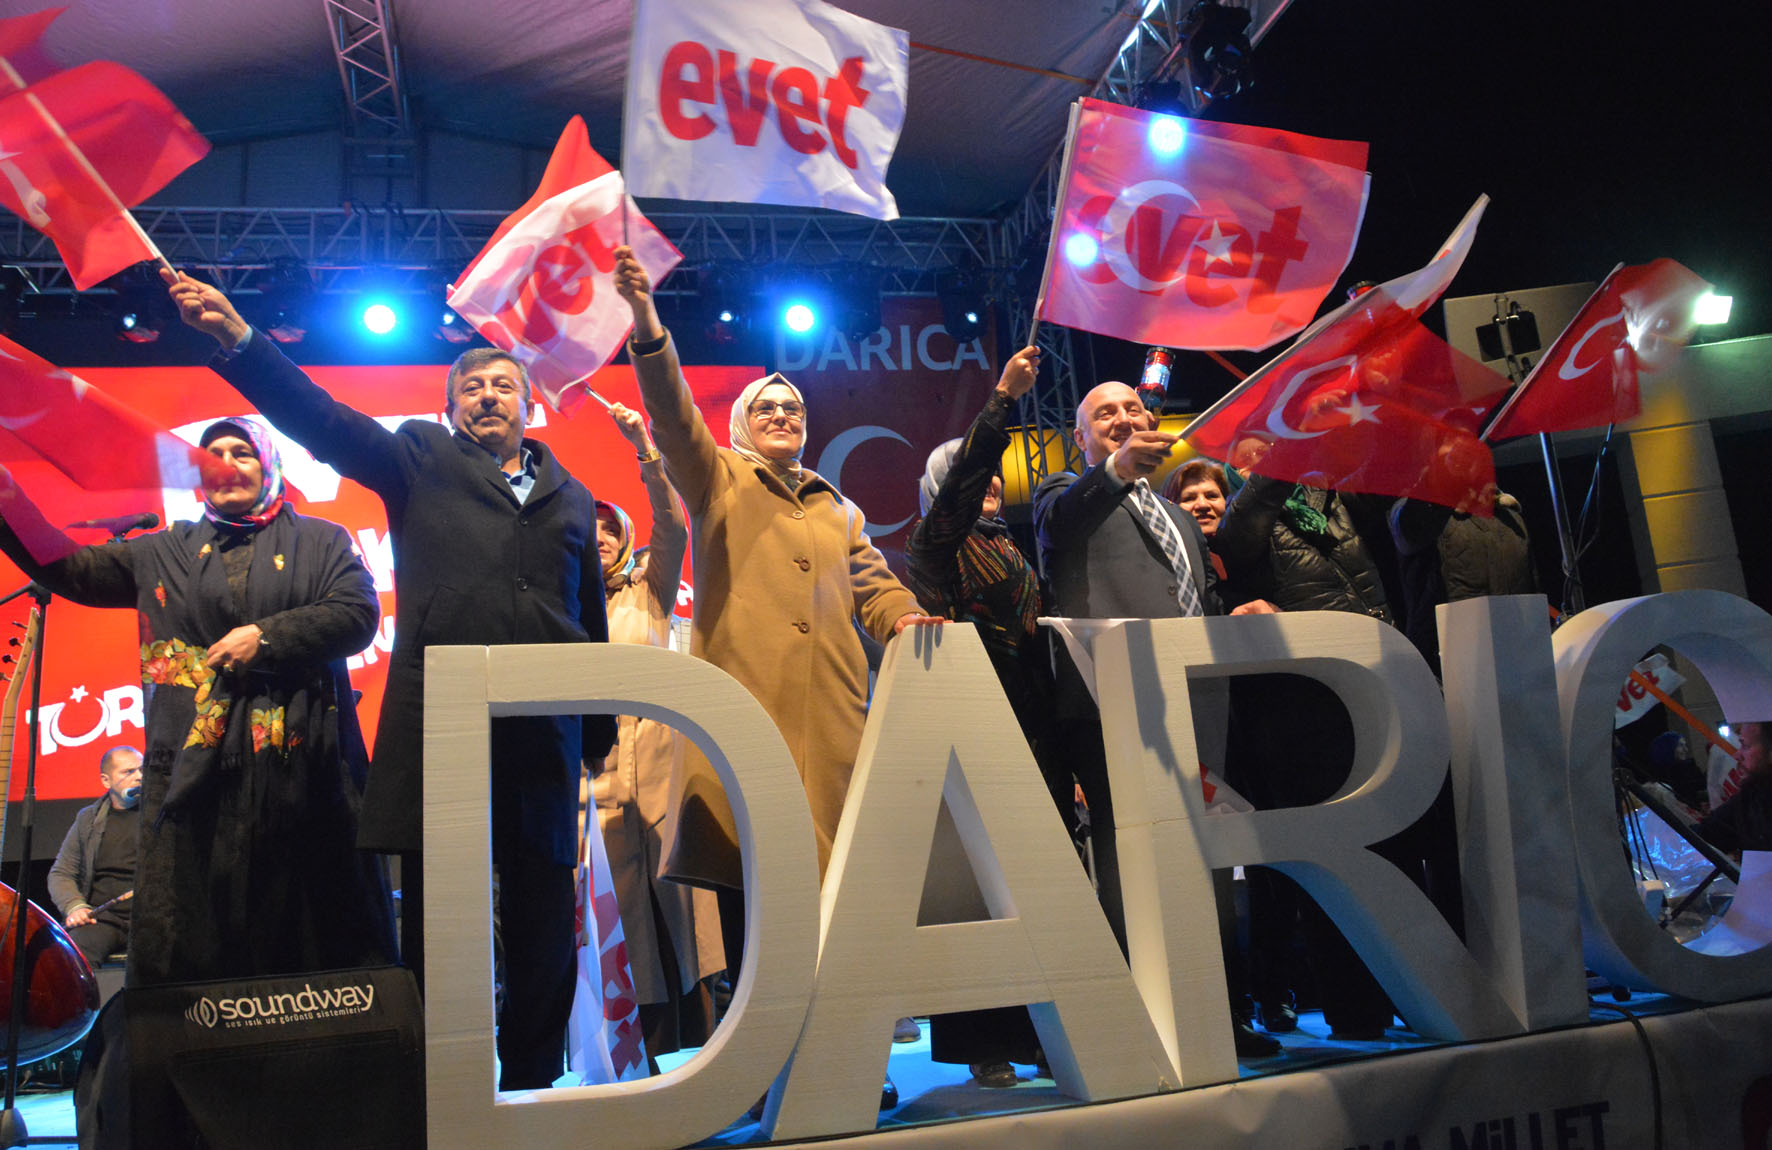 DARICA 'EVET'E YÜRÜDÜ!